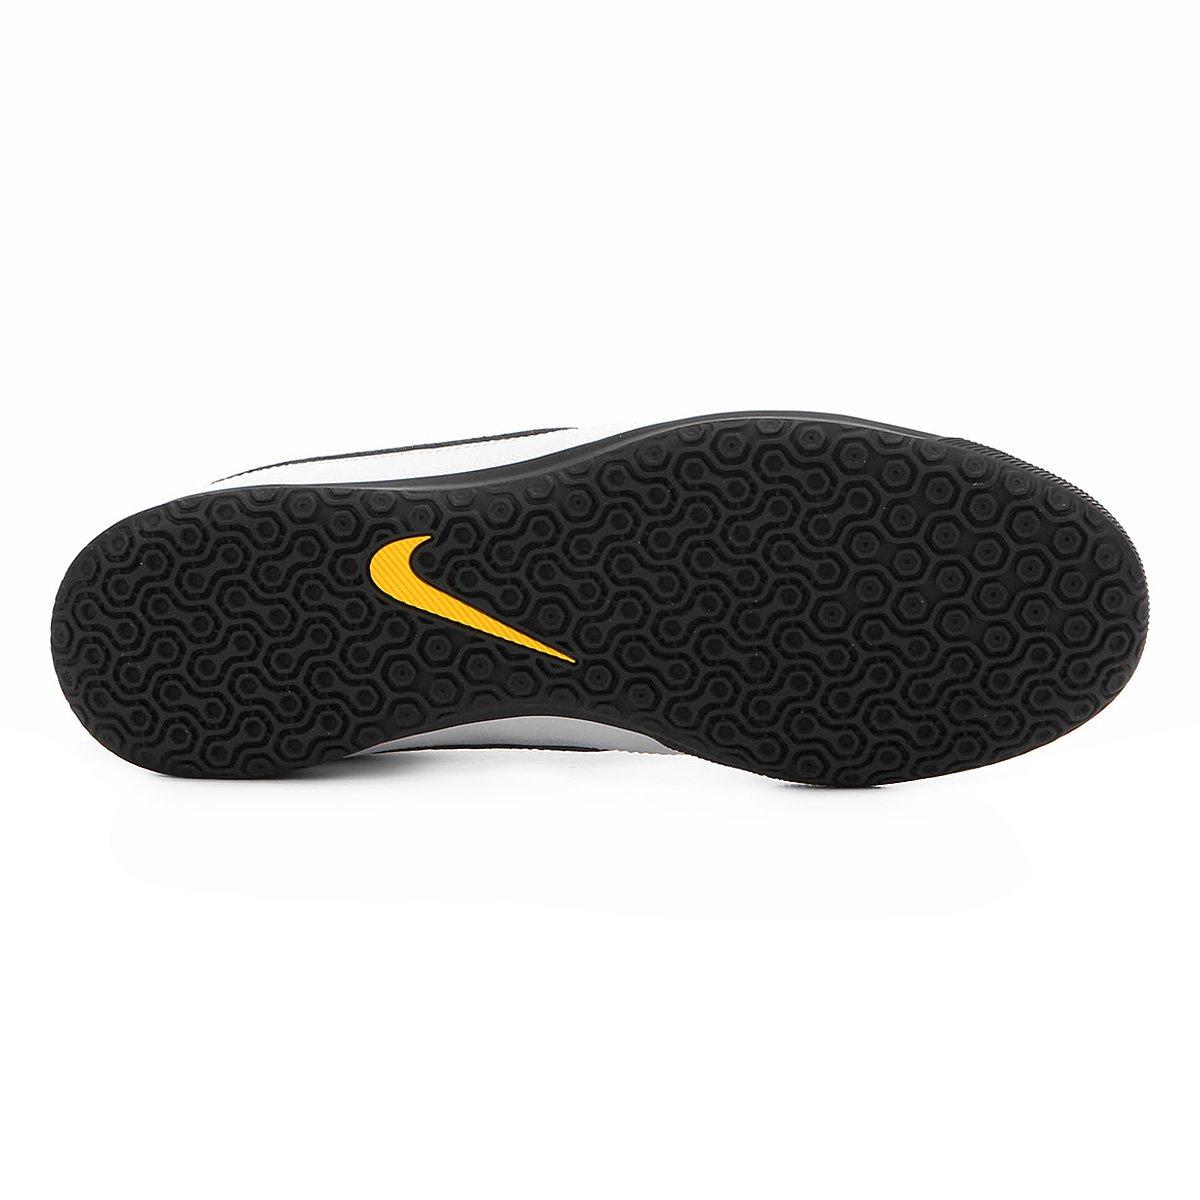 Chuteira Futsal Nike Majestry IC - Branco e Preto - Compre Agora ... f83a9b96e51ff